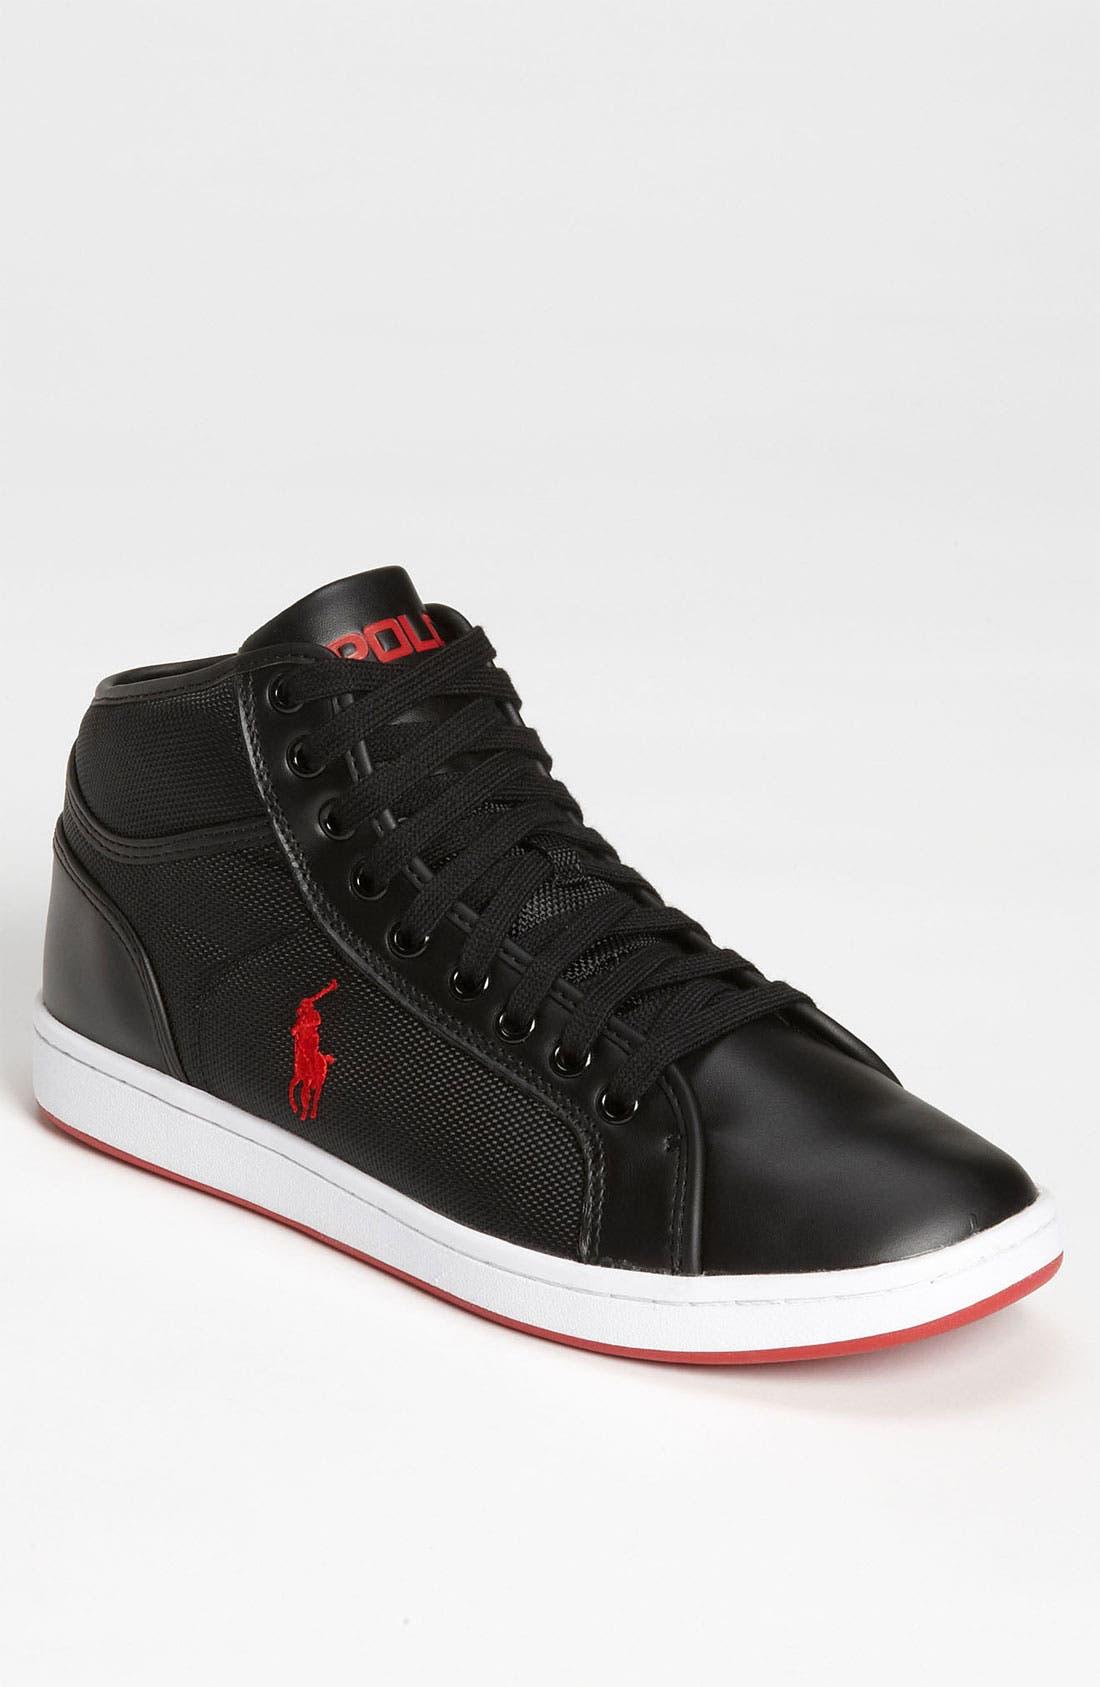 Main Image - Polo Ralph Lauren 'Trevose' Sneaker